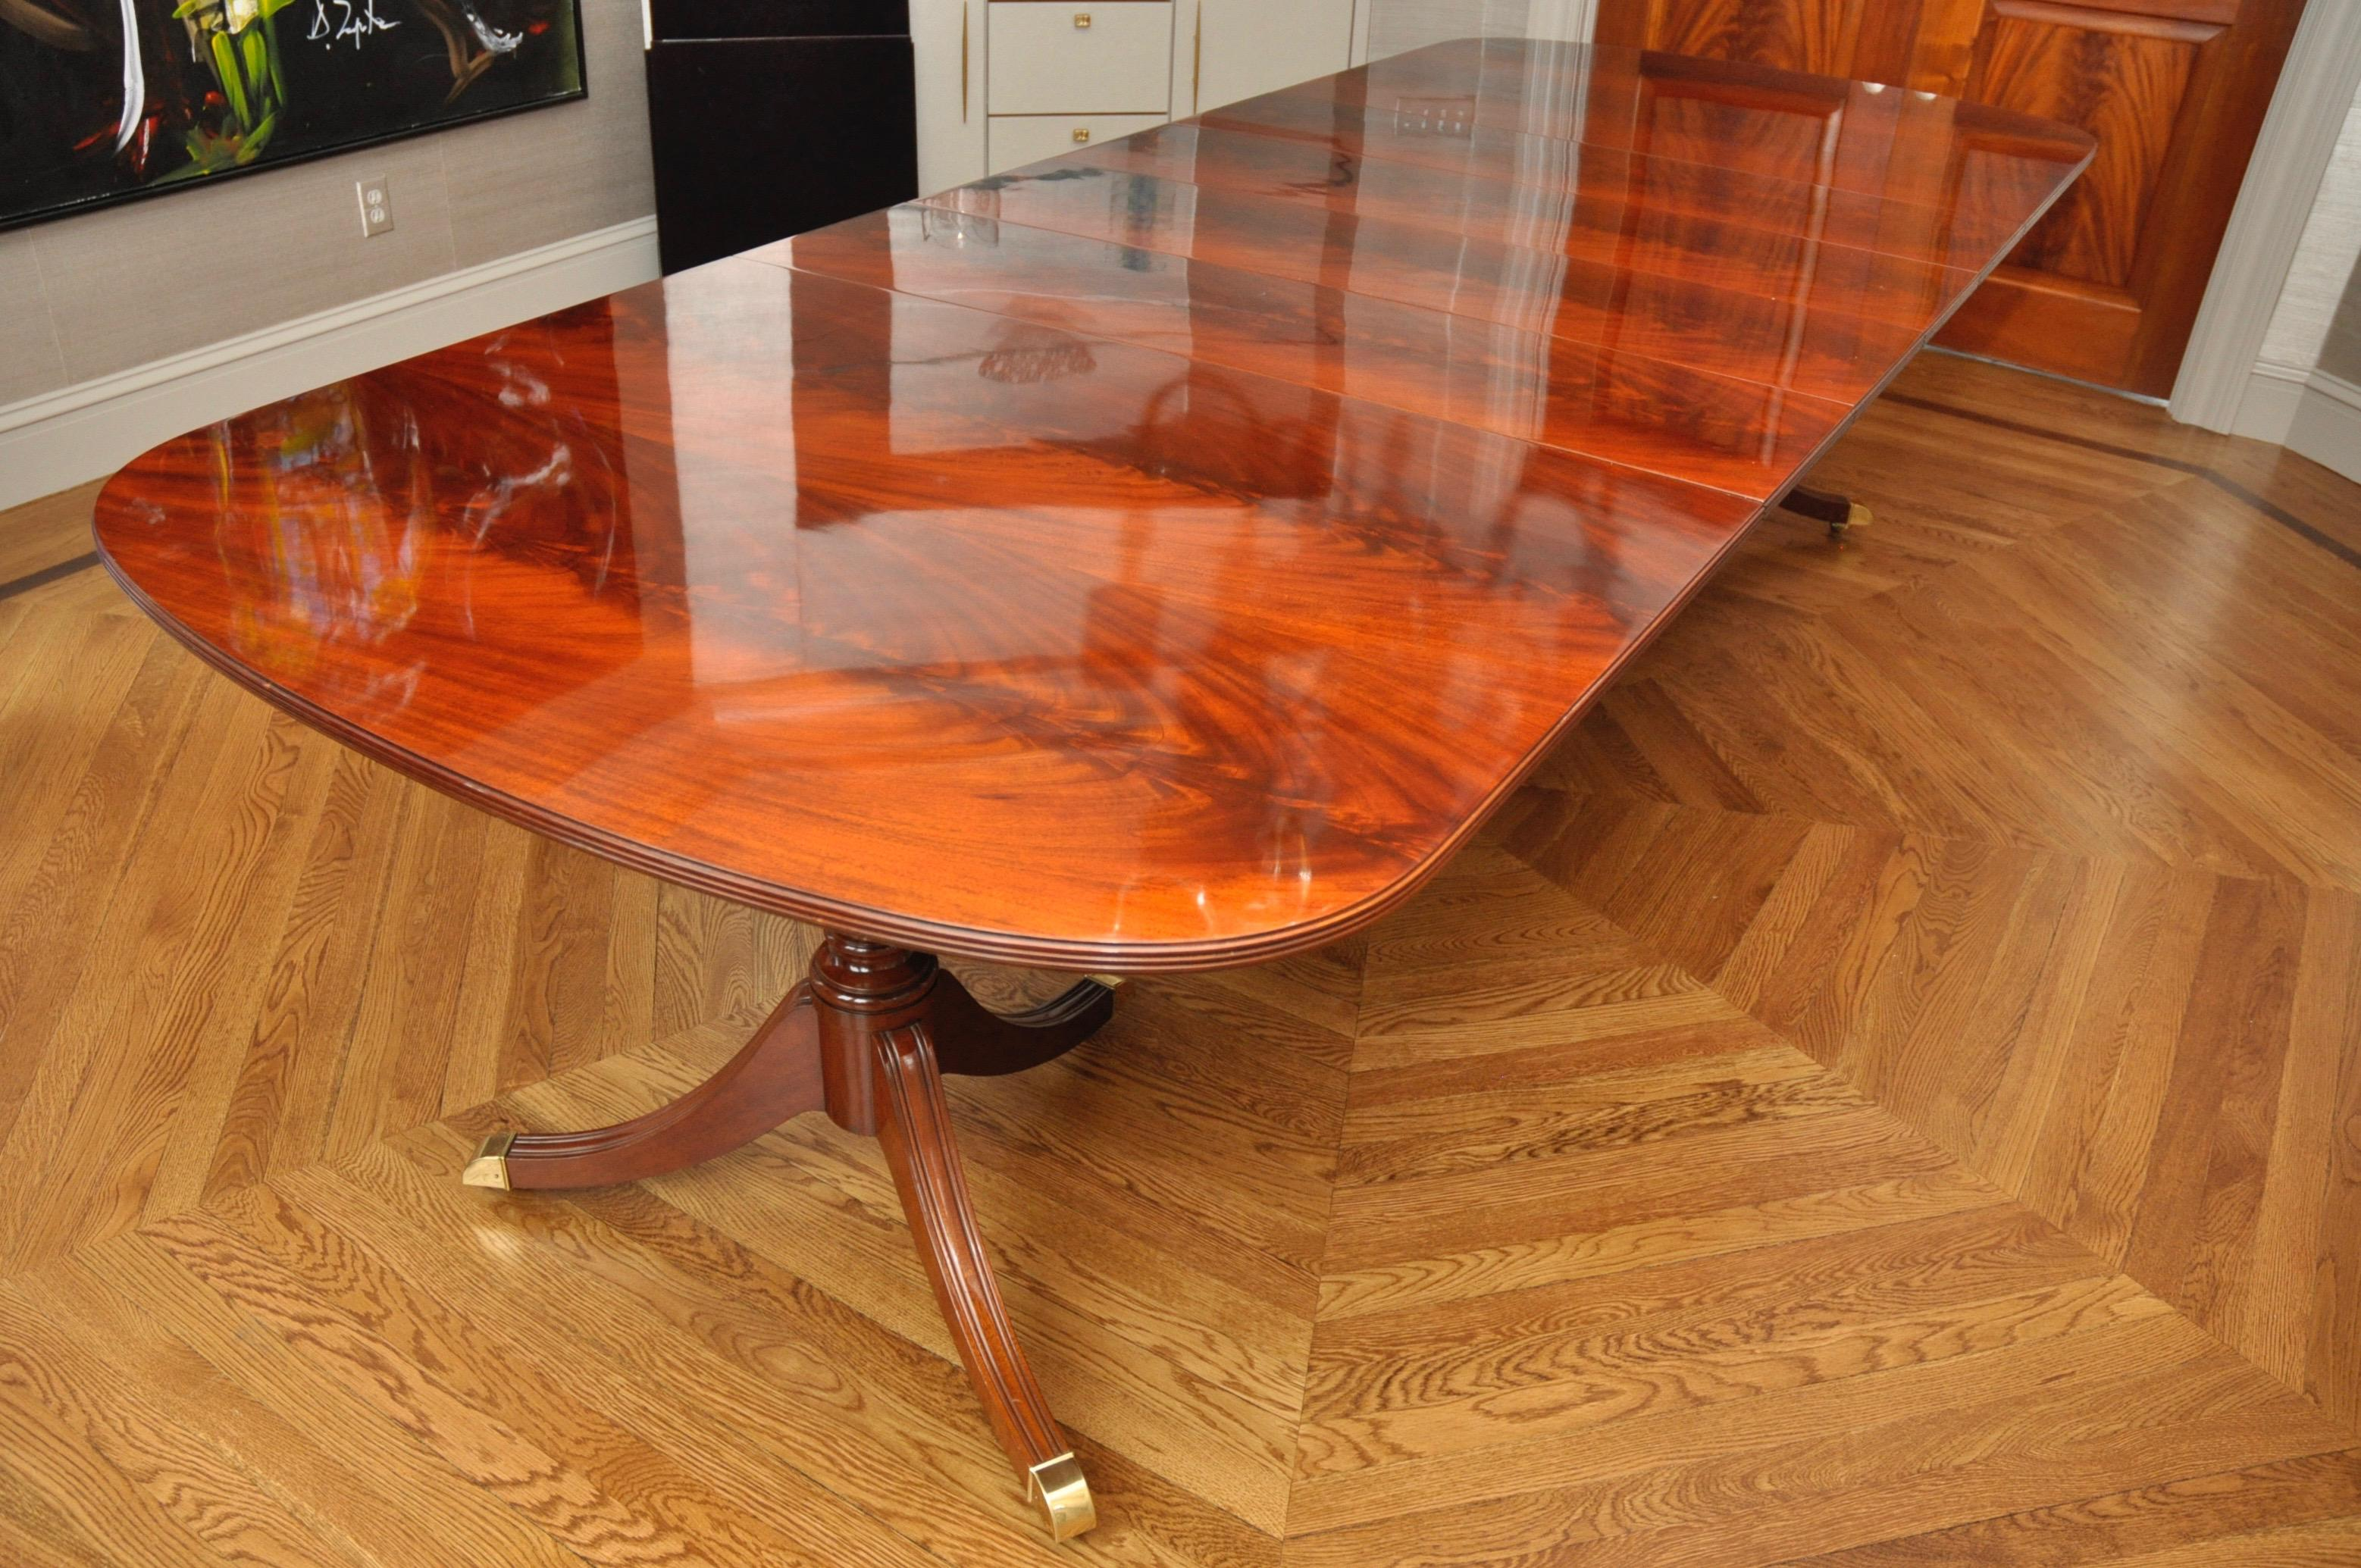 Kindel Crotch Mahogany Pedestal Dining Table Chairish : a1f0b015 06e7 4e85 8550 0c546ad07a80aspectfitampwidth640ampheight640 from www.chairish.com size 640 x 640 jpeg 51kB